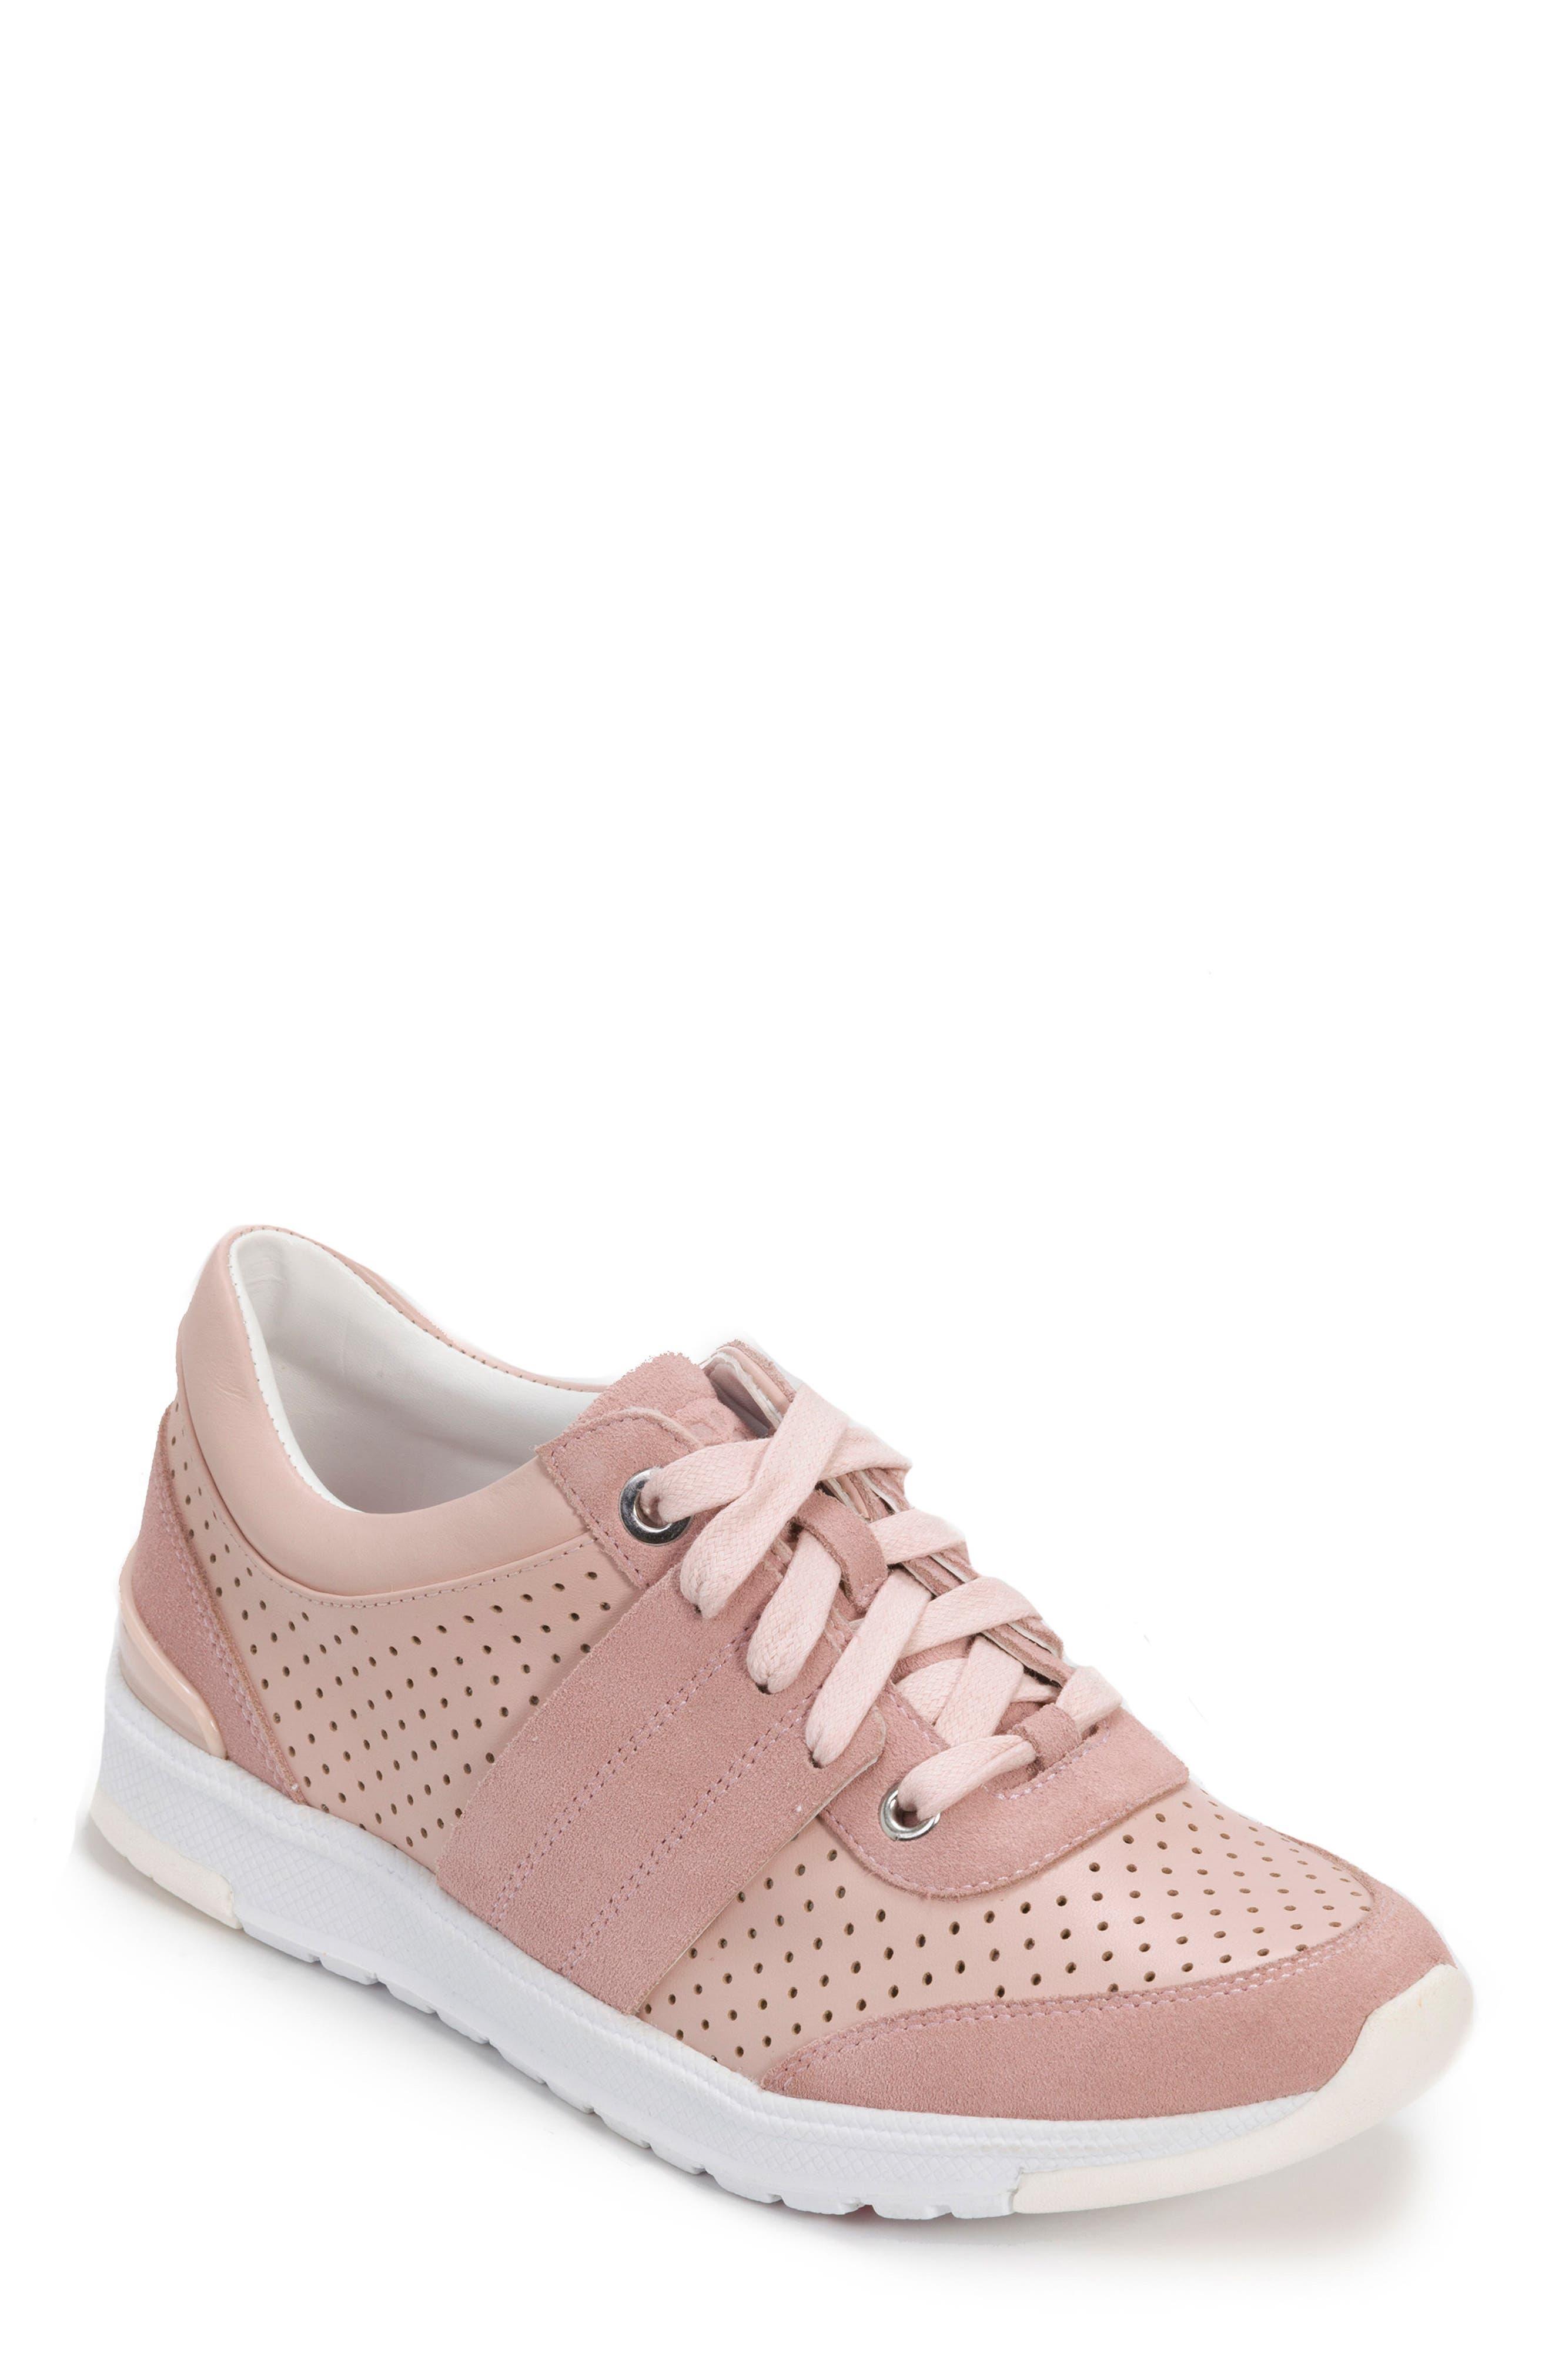 Bea Sneaker,                             Main thumbnail 1, color,                             Blush Leather